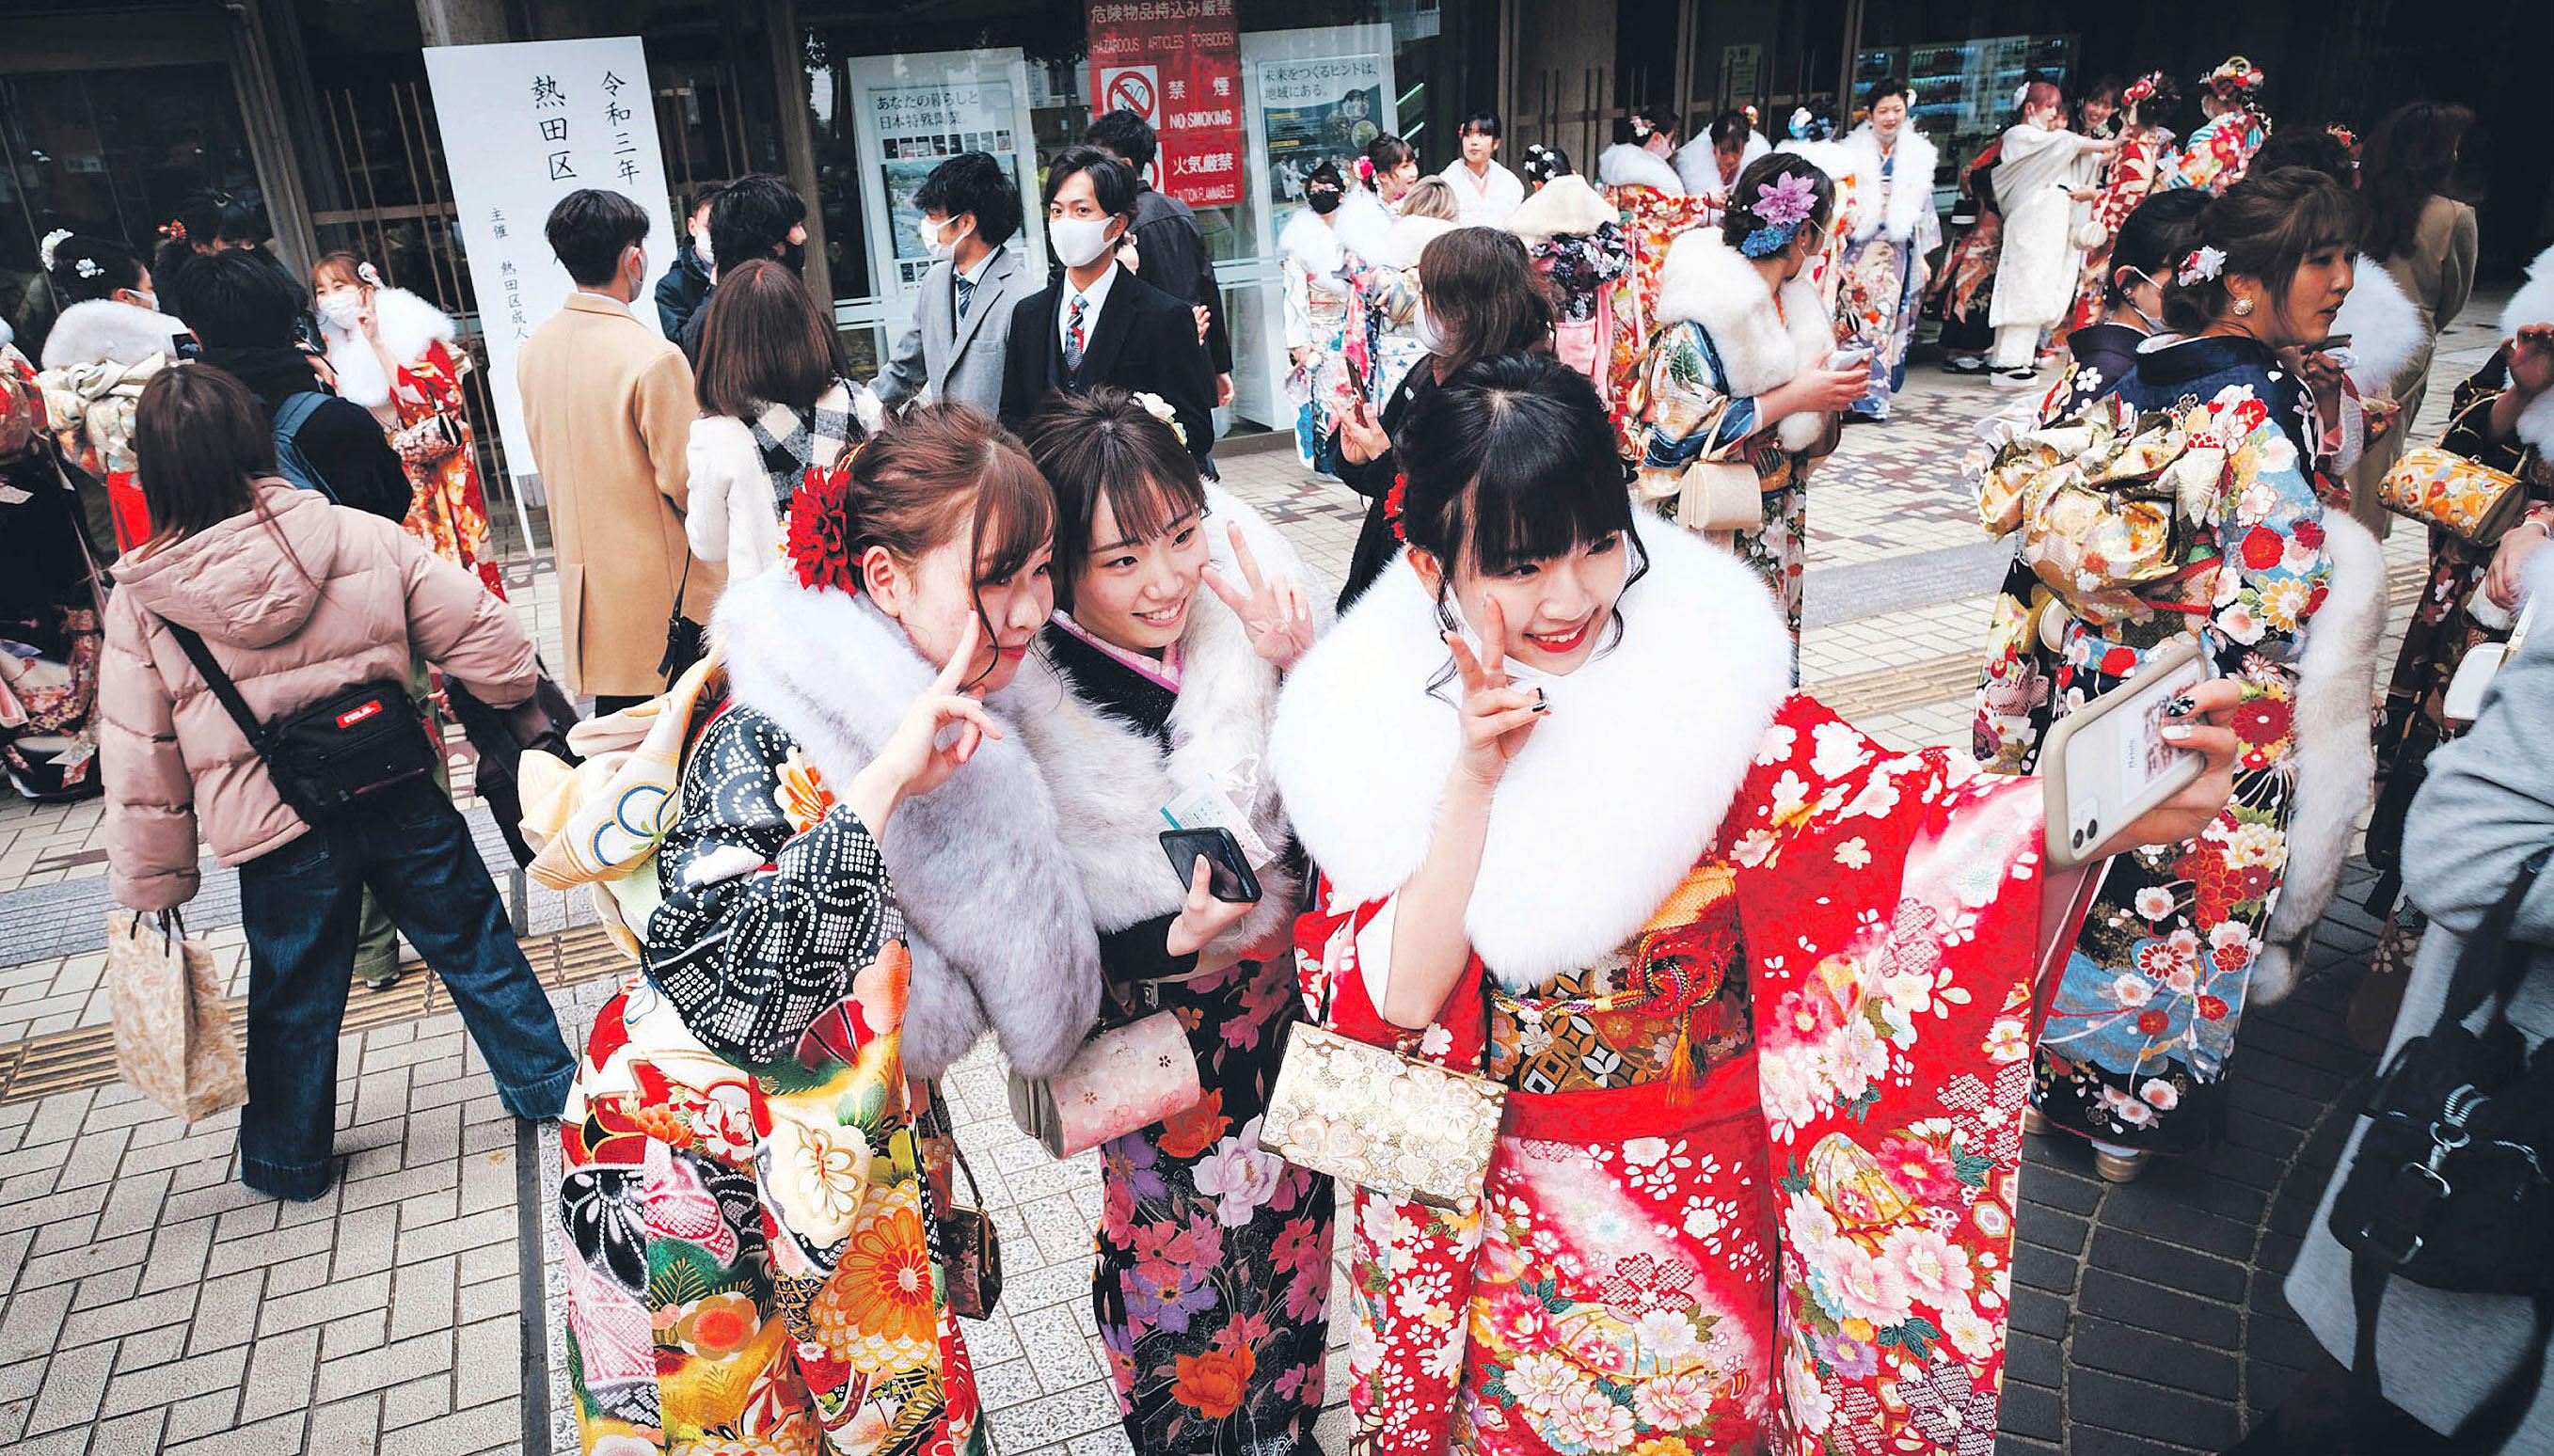 Guardian 210112 Nagoya by Ben Weller.jpg